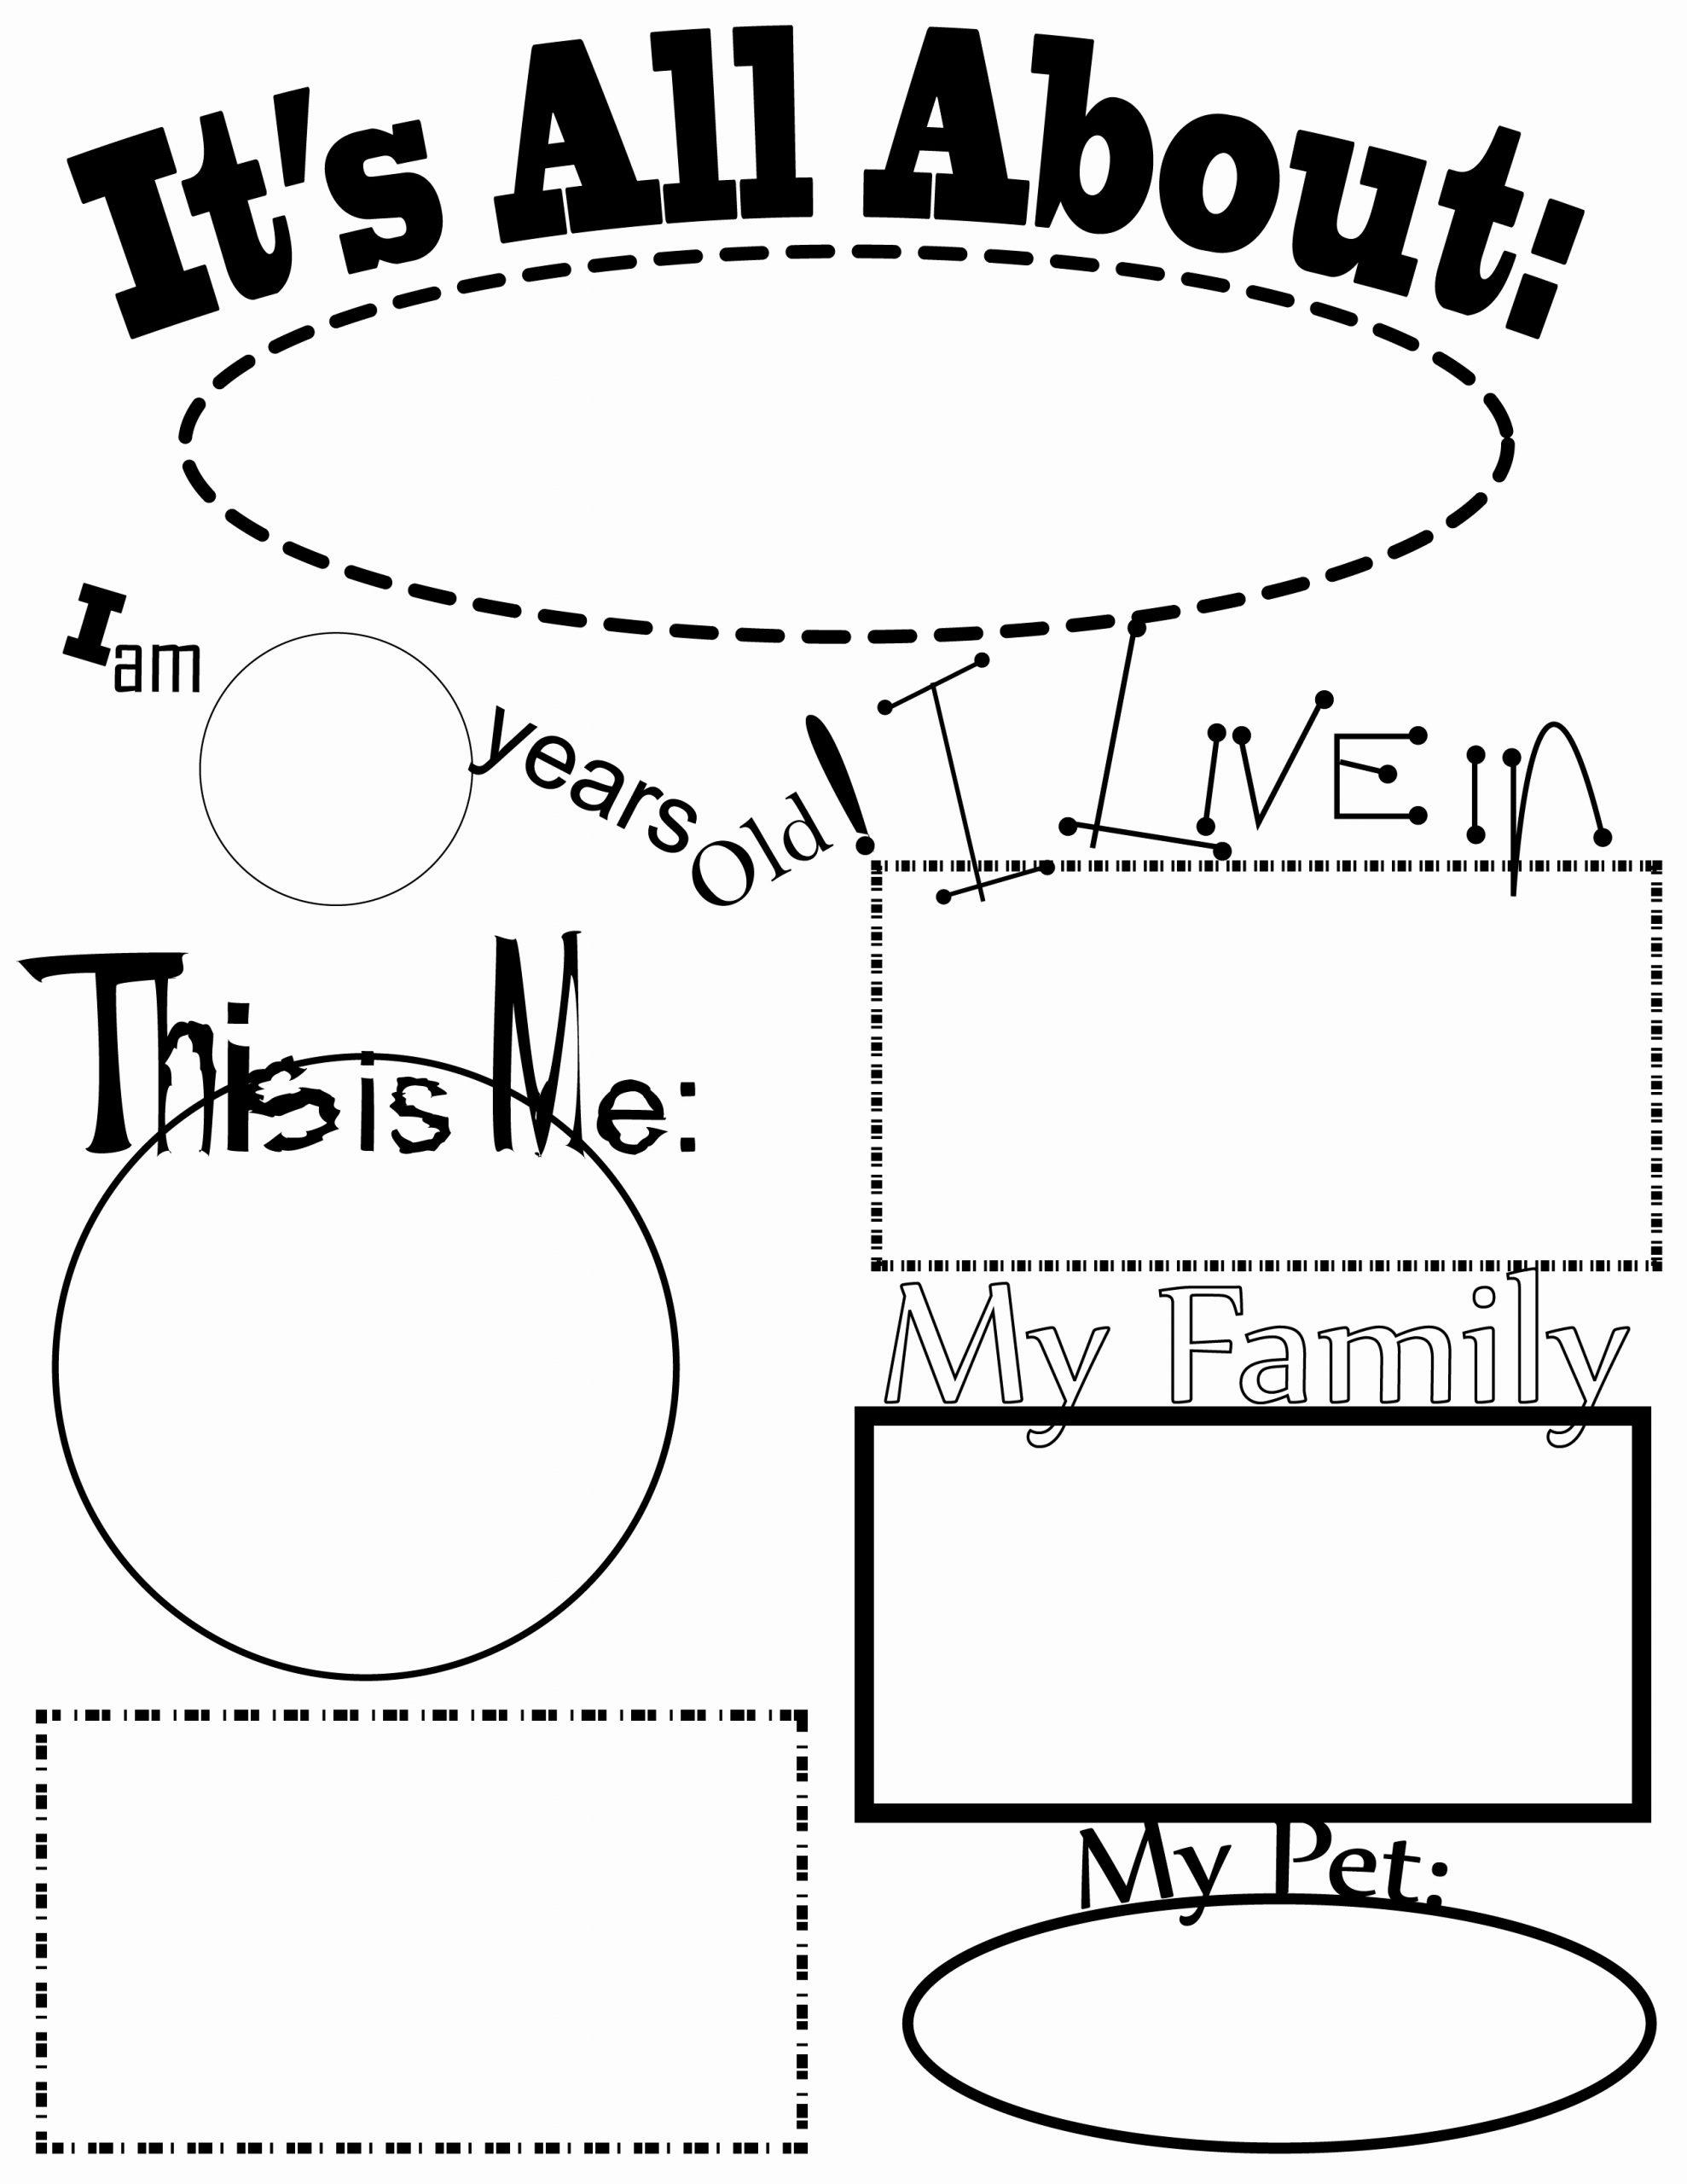 Self Esteem Activities Worksheets New Self Esteem Worksheets for Elementary Students — Db Excel